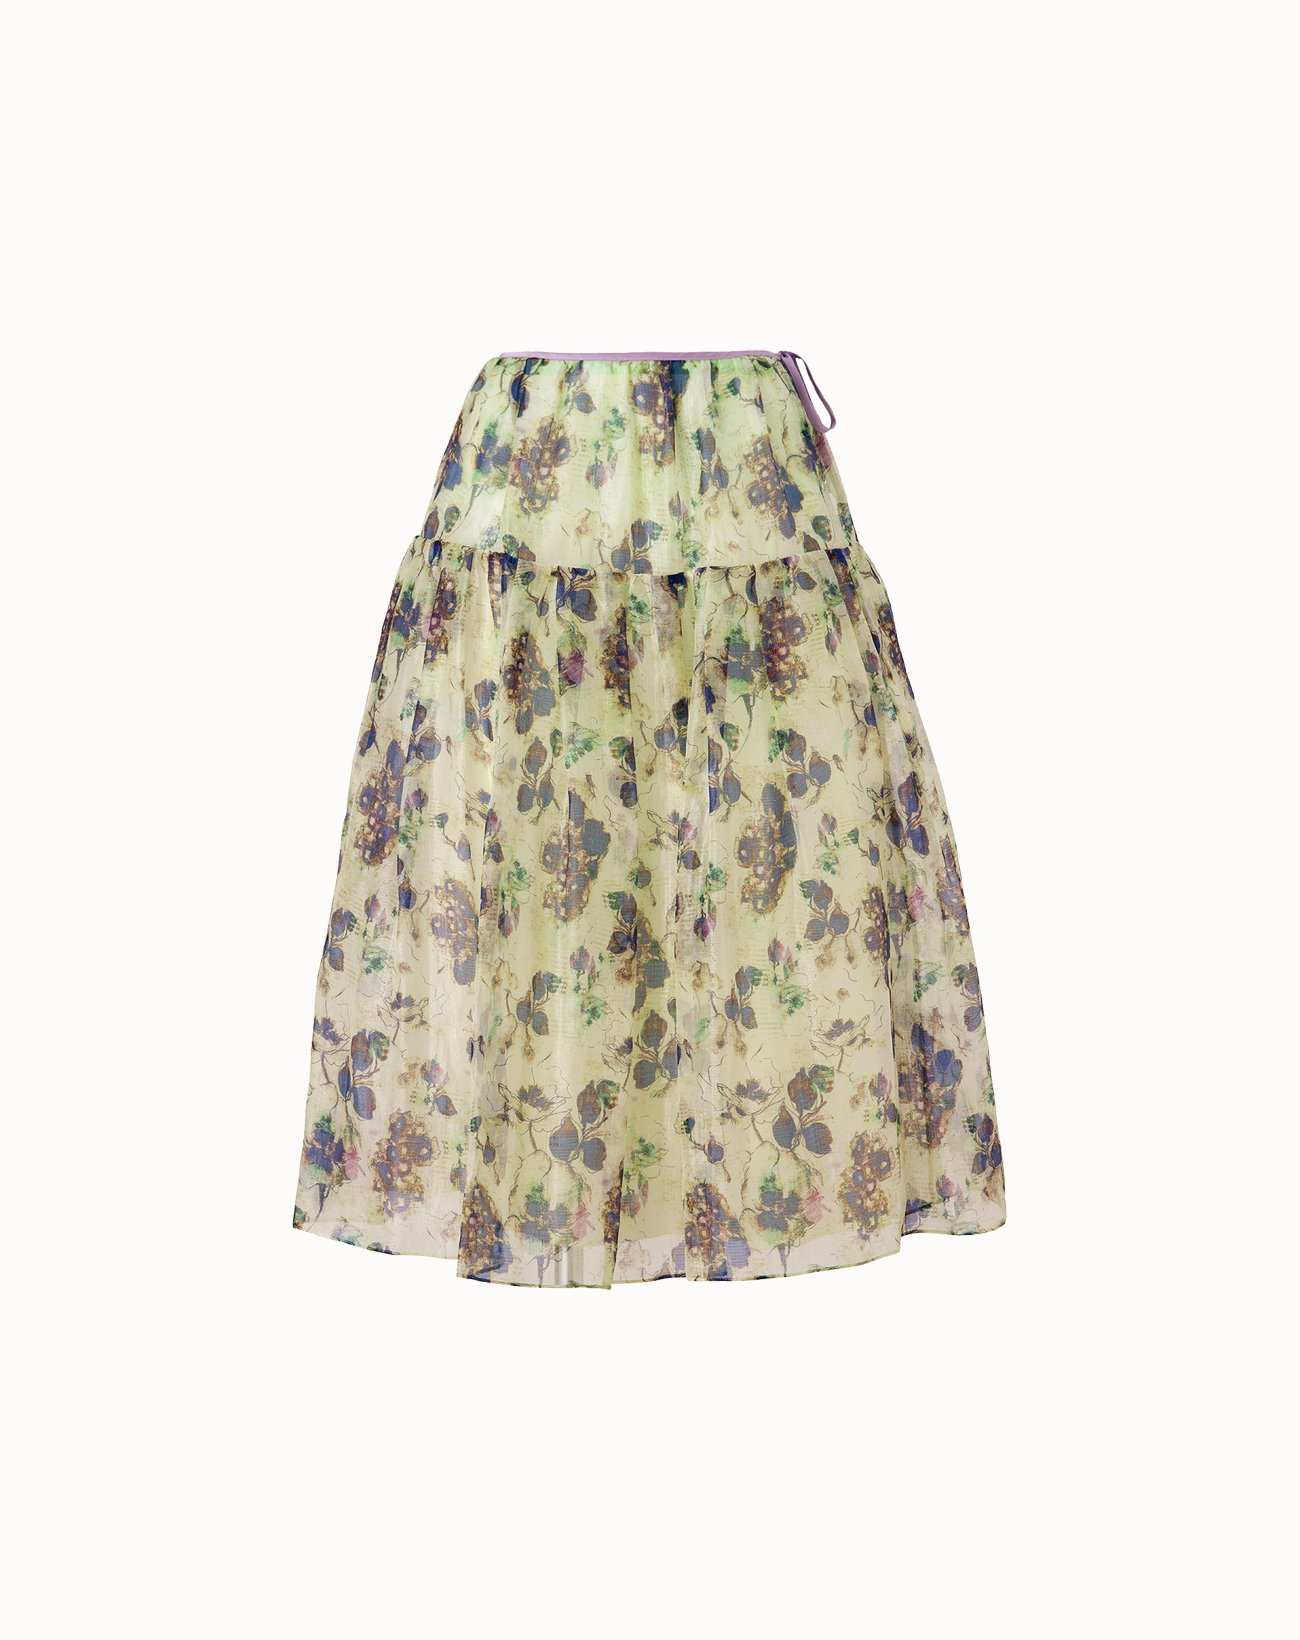 Antique Flower Skirt - Green